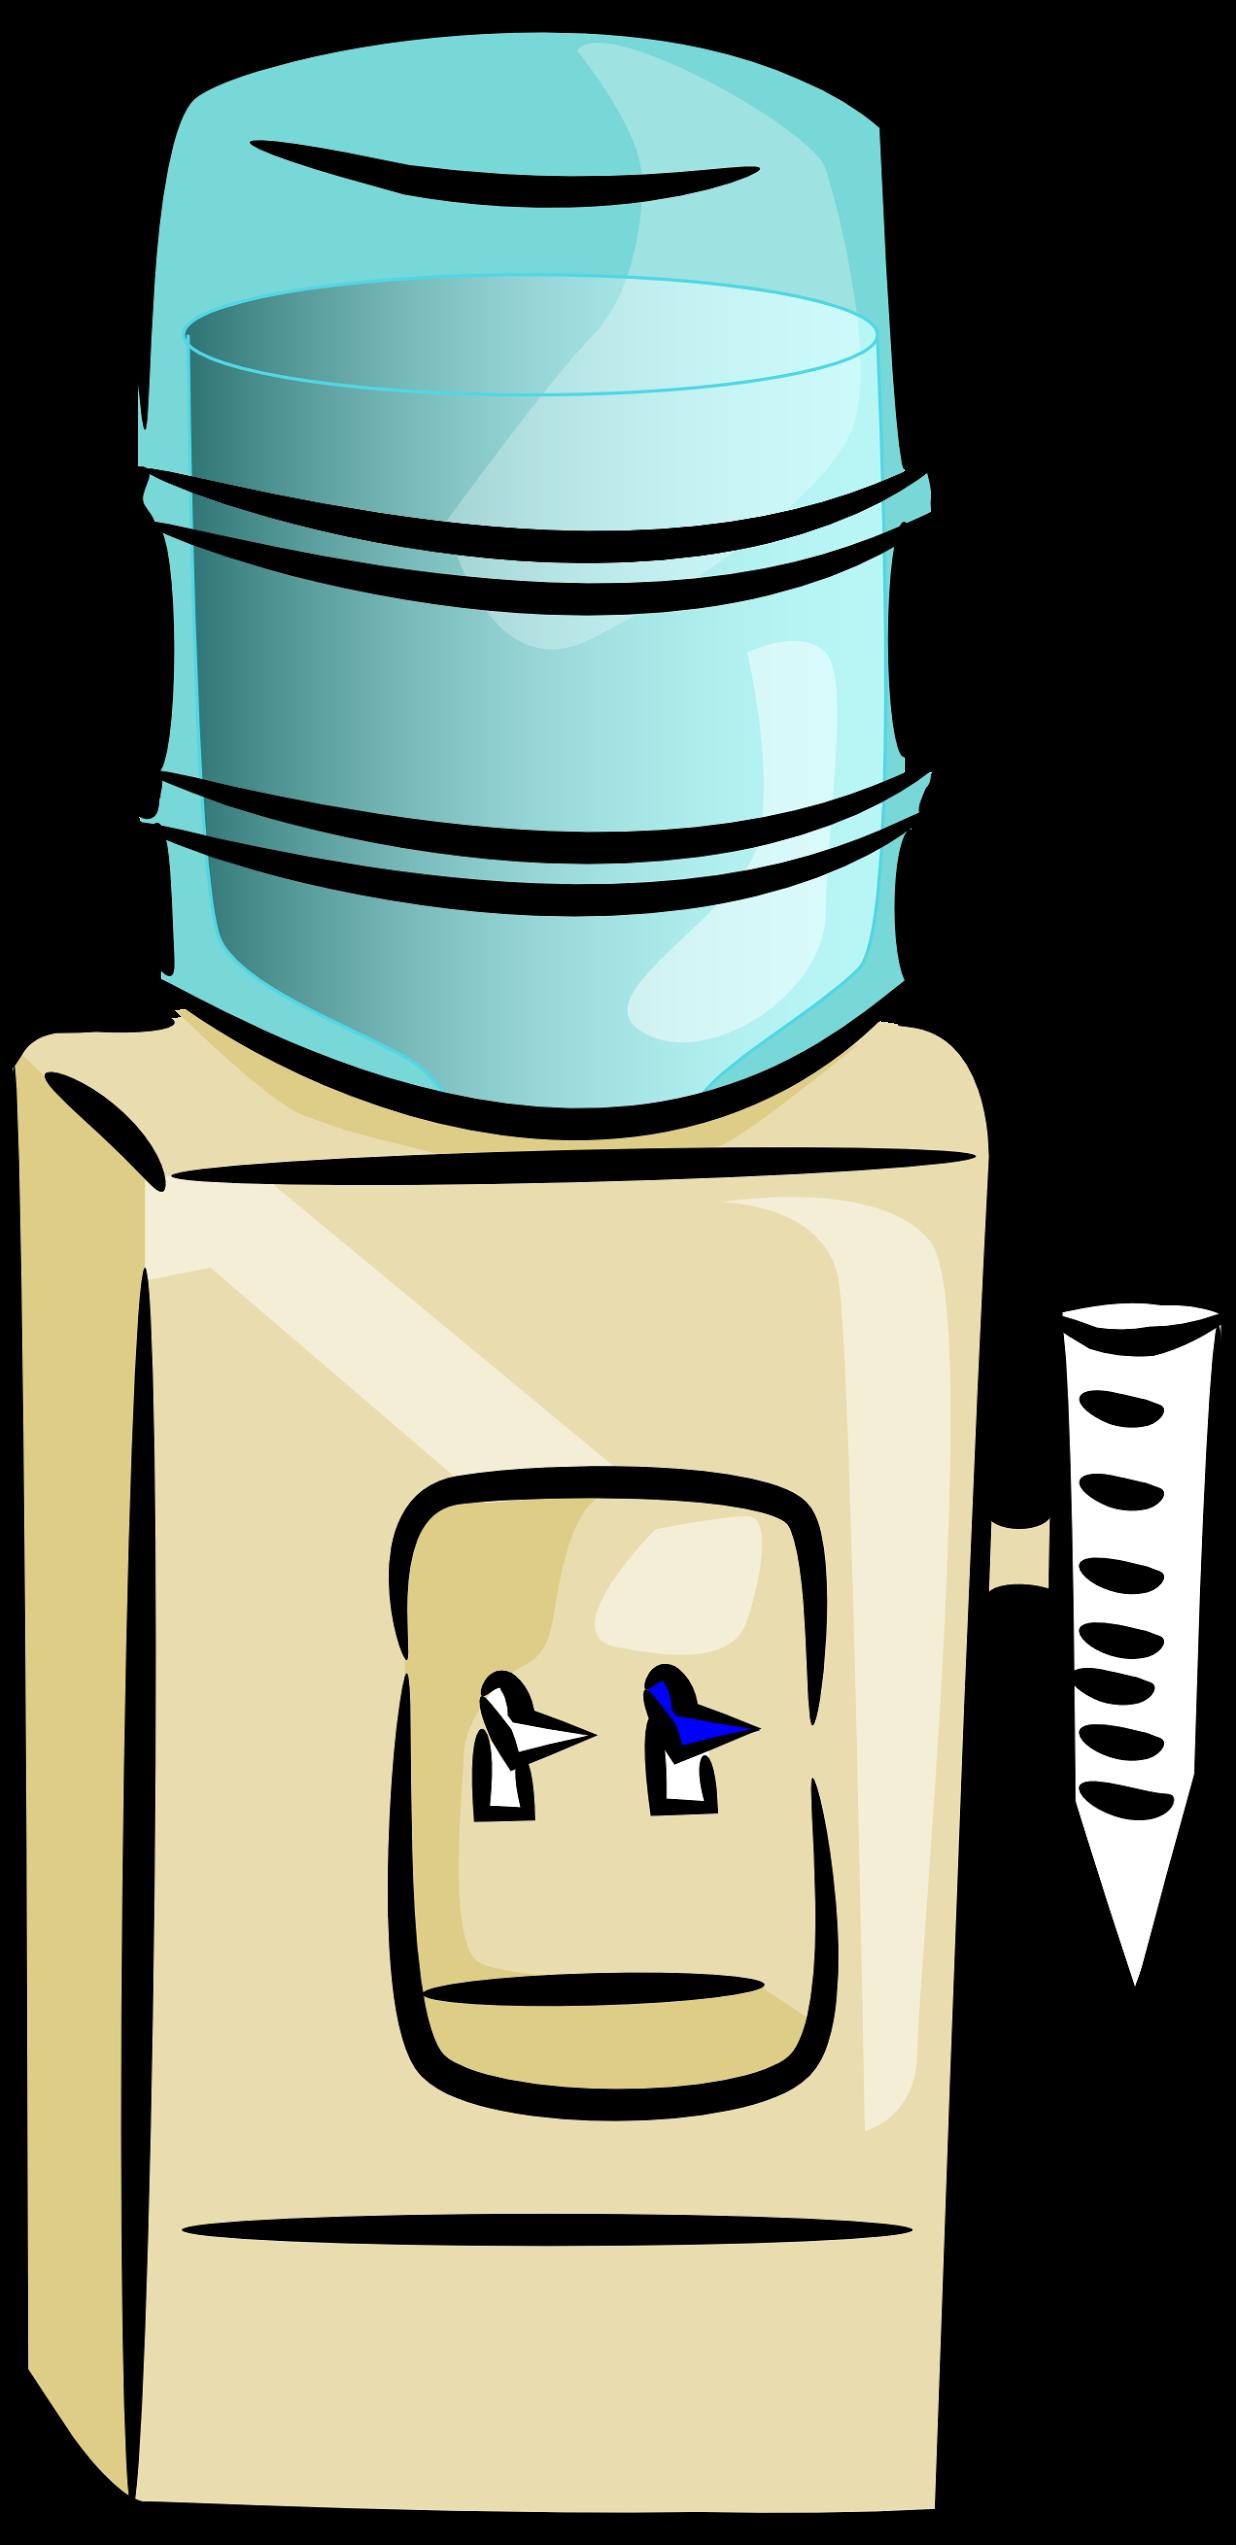 Free Cooler Cliparts, Download Free Clip Art, Free Clip Art.